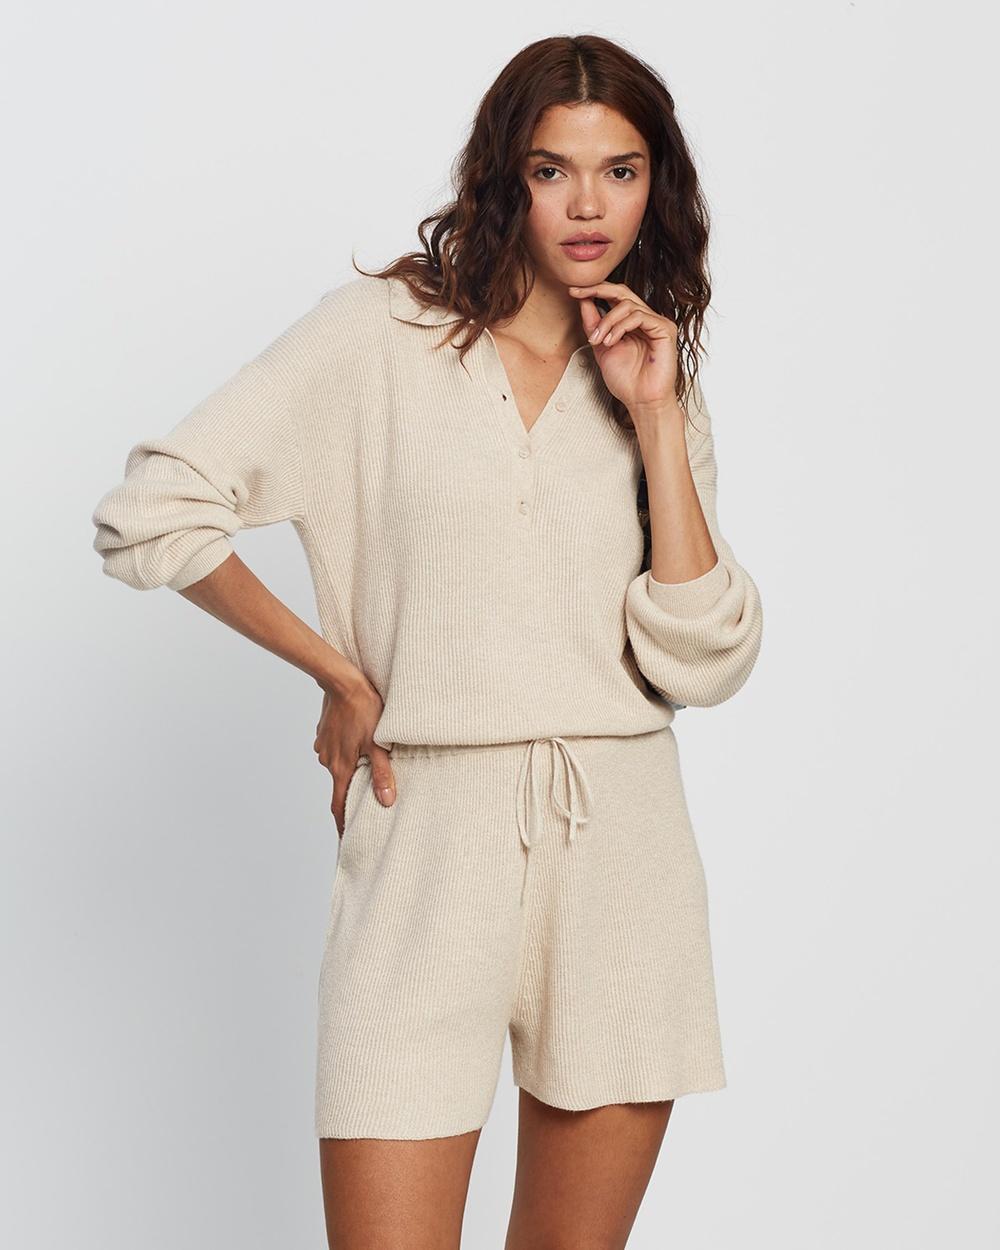 AERE Organic Cotton & Cashmere Knit Playsuit Jumpsuits Playsuits Chantilly Lace